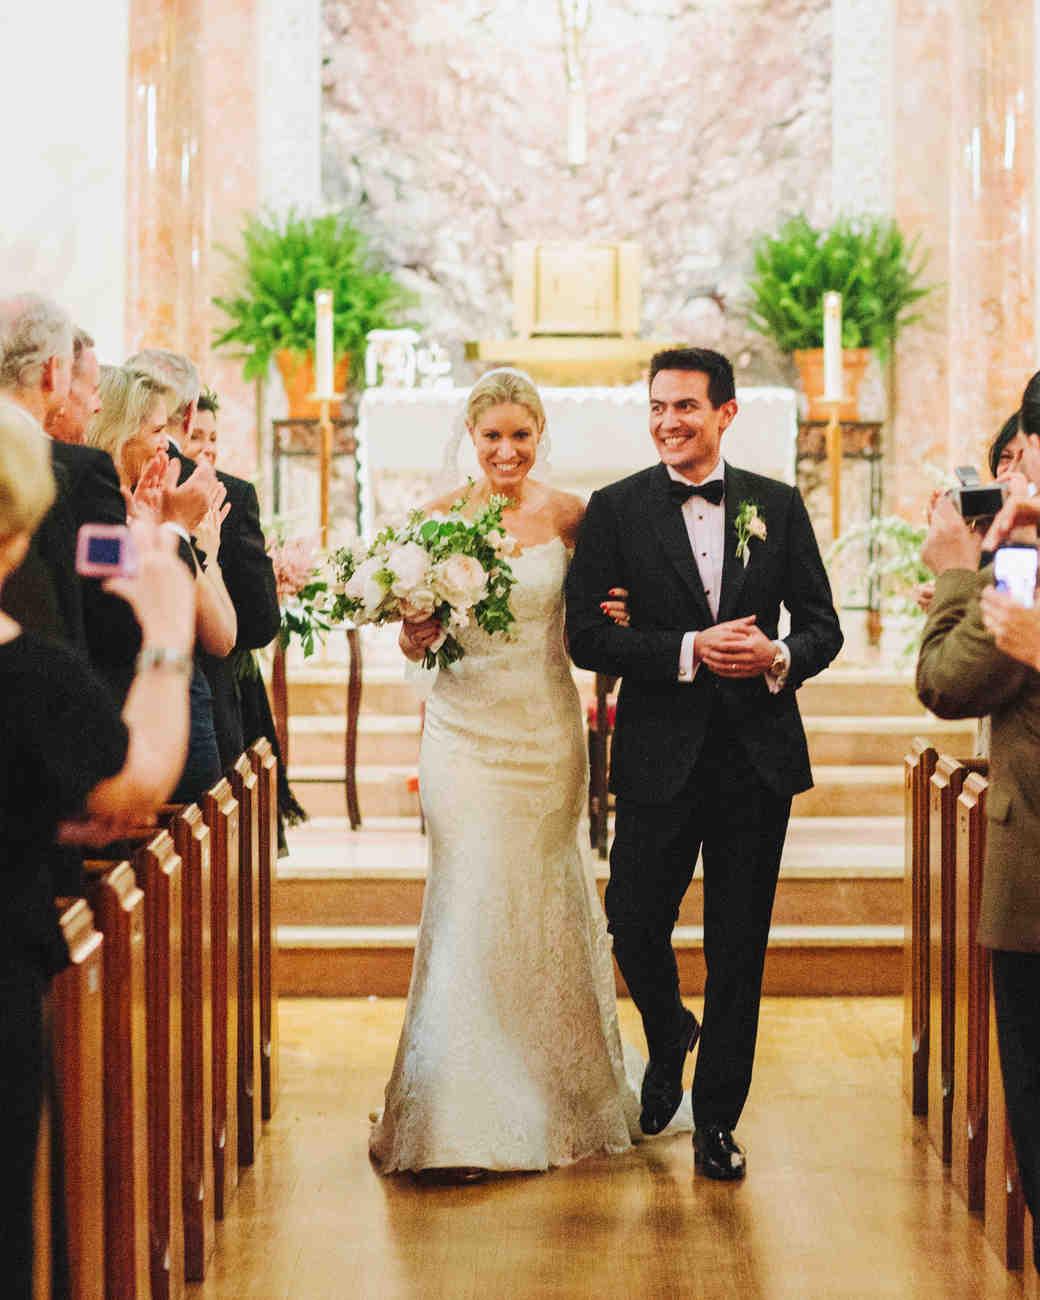 tina-raul-wedding-ceremony4-0314.jpg